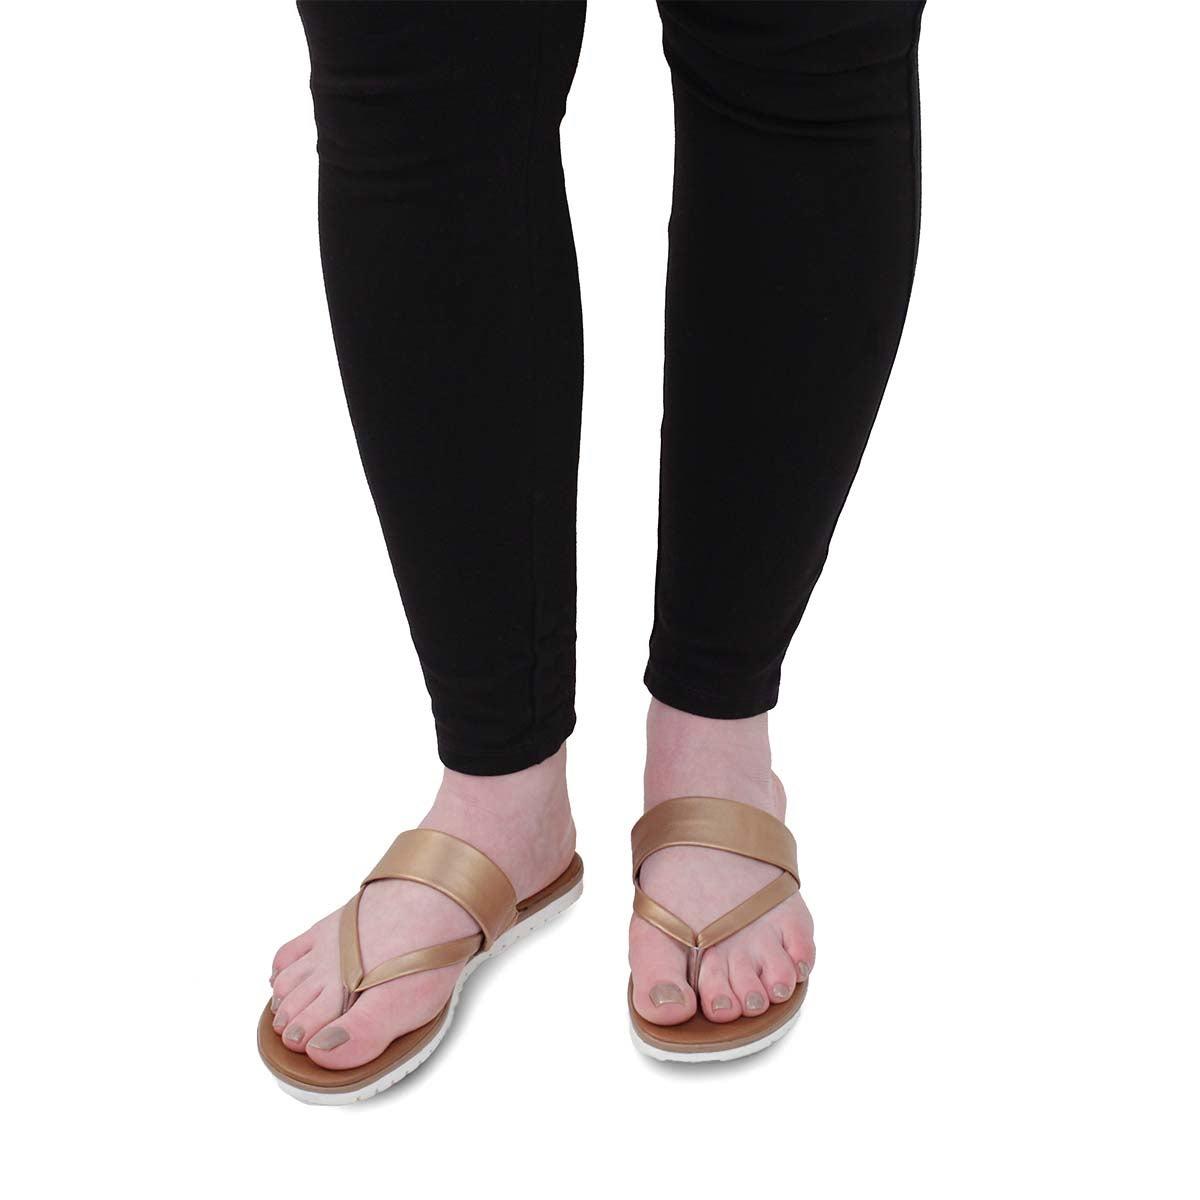 Lds Giselle rose gold thong sandal